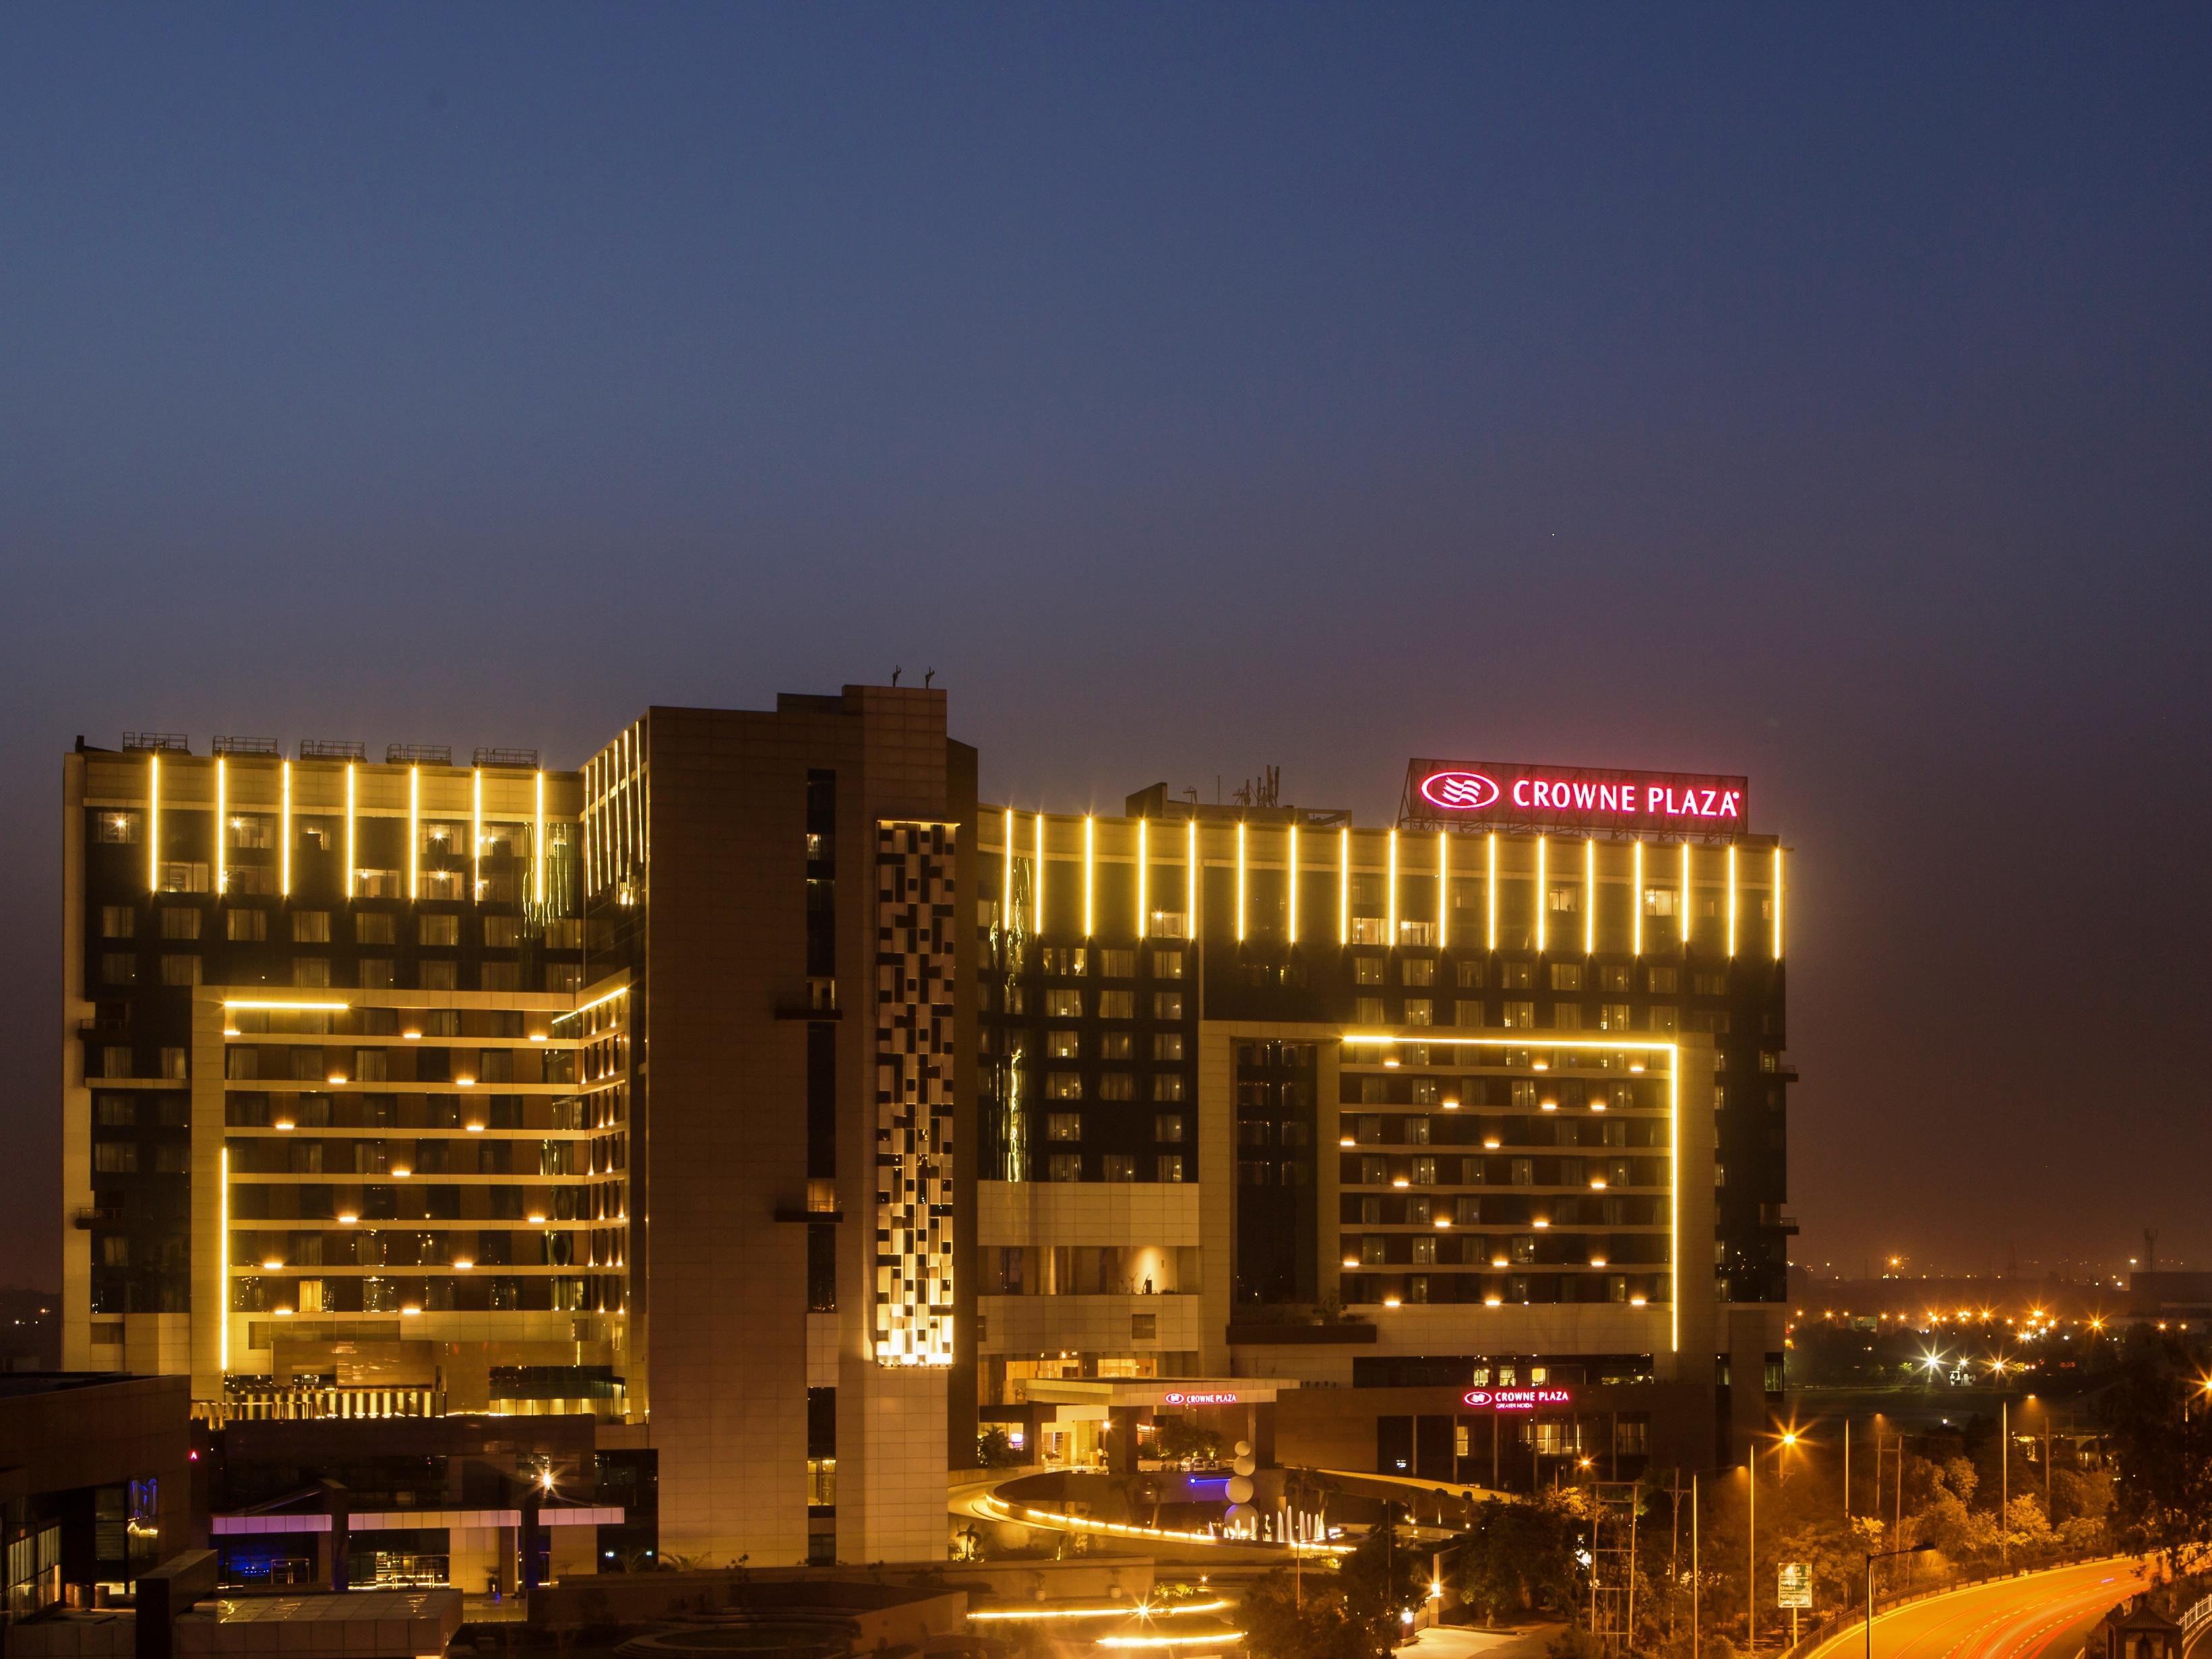 Crowne Plaza Greater Noida - Delhi - NCR c613aa0aef956